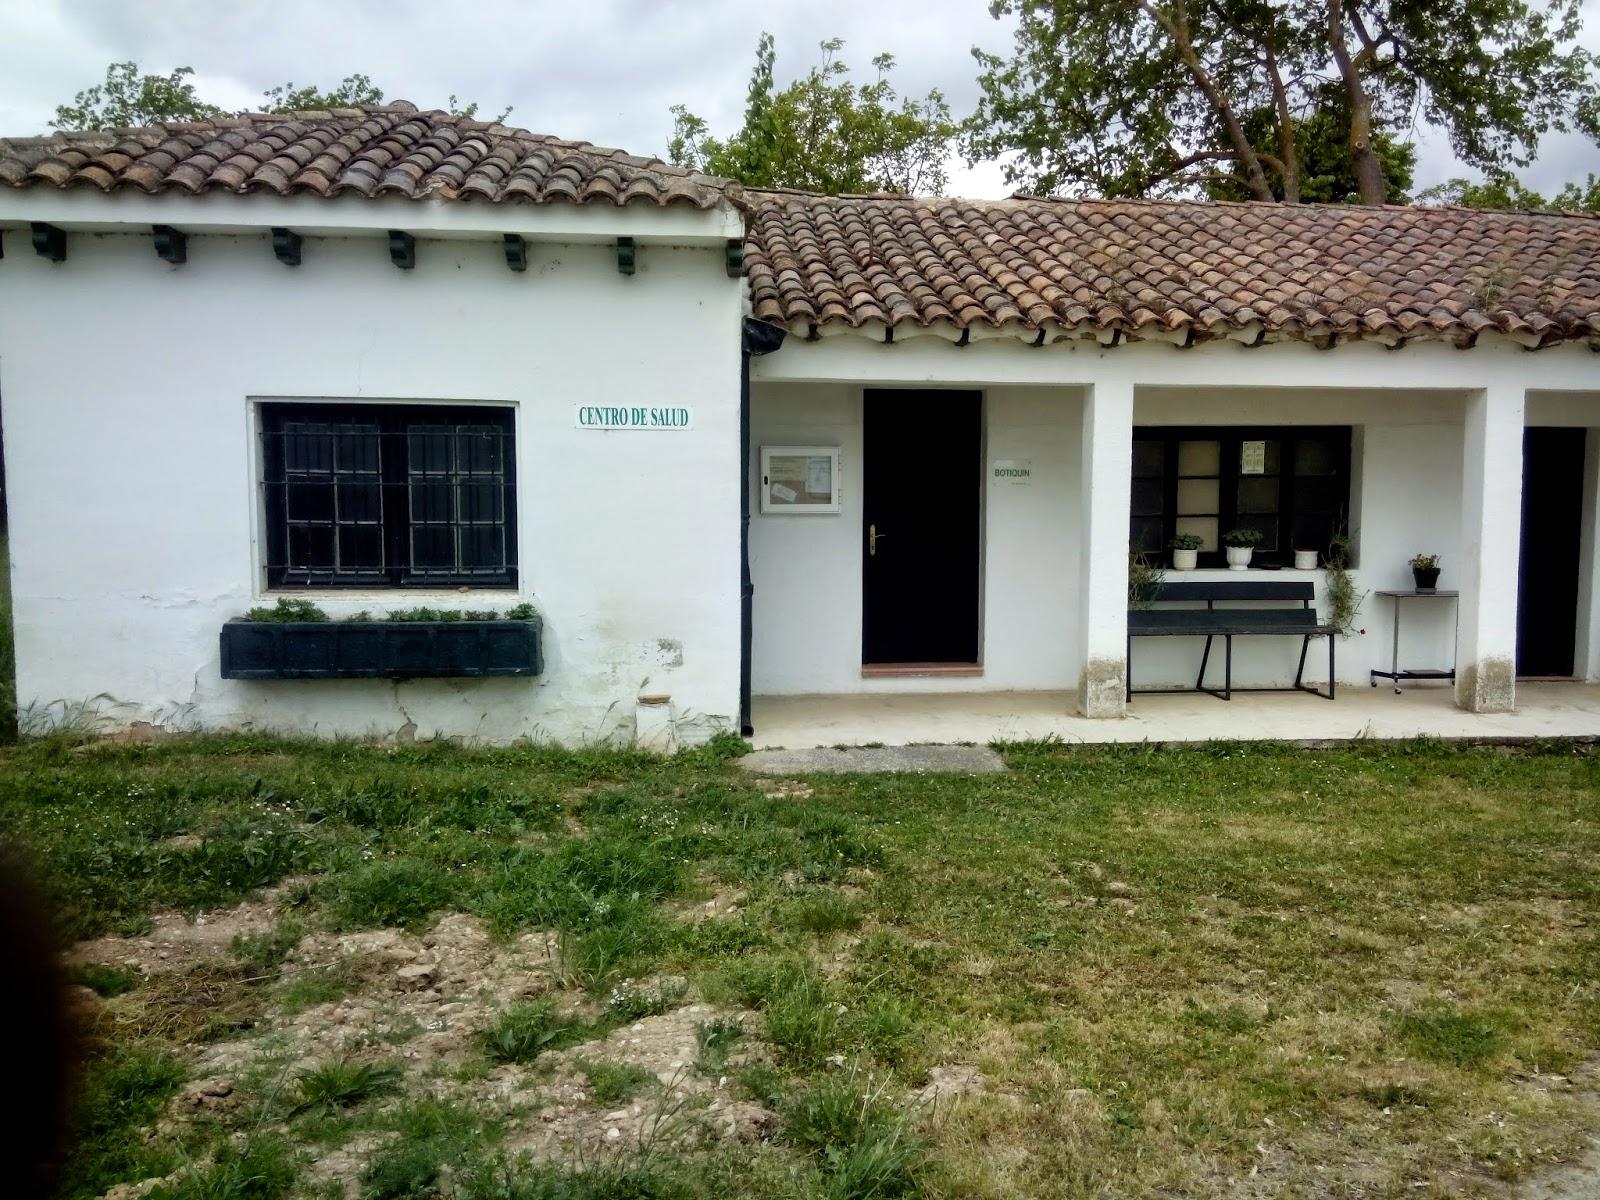 Granja avicola fontecha casas blancas - Casas para gallinas ...